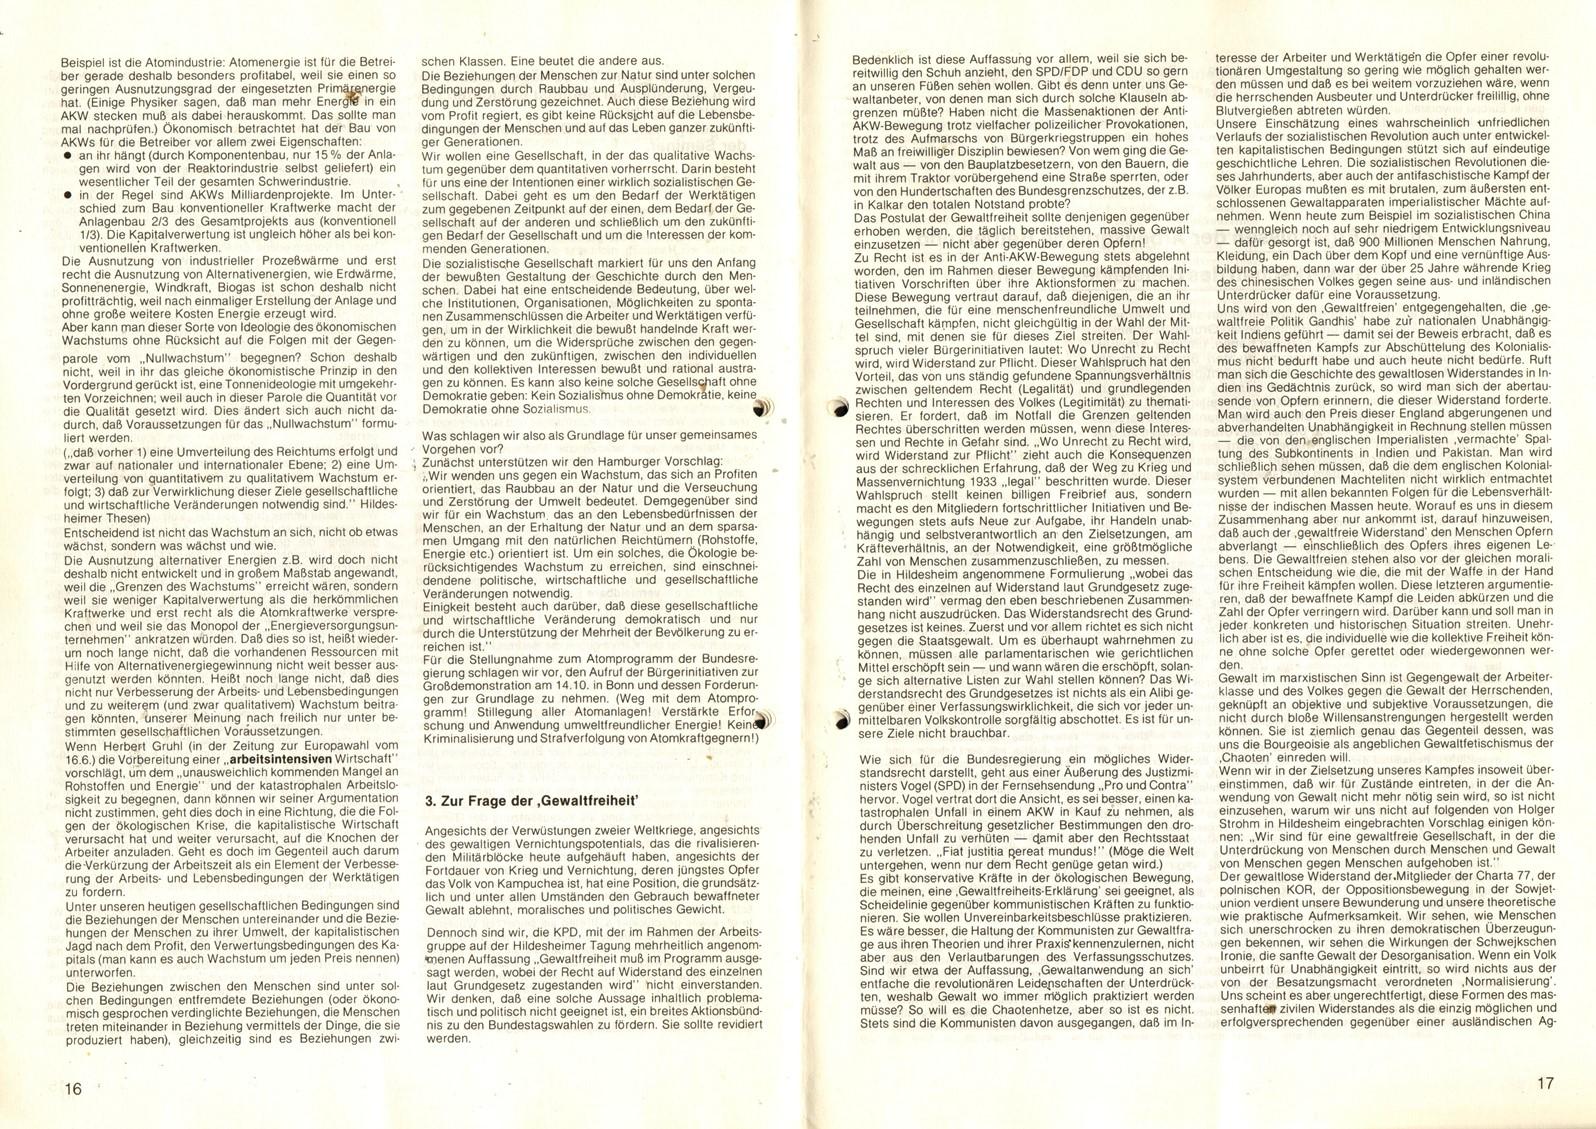 KPDAO_1979_Diskussion_Bundestagswahlen_1980_09